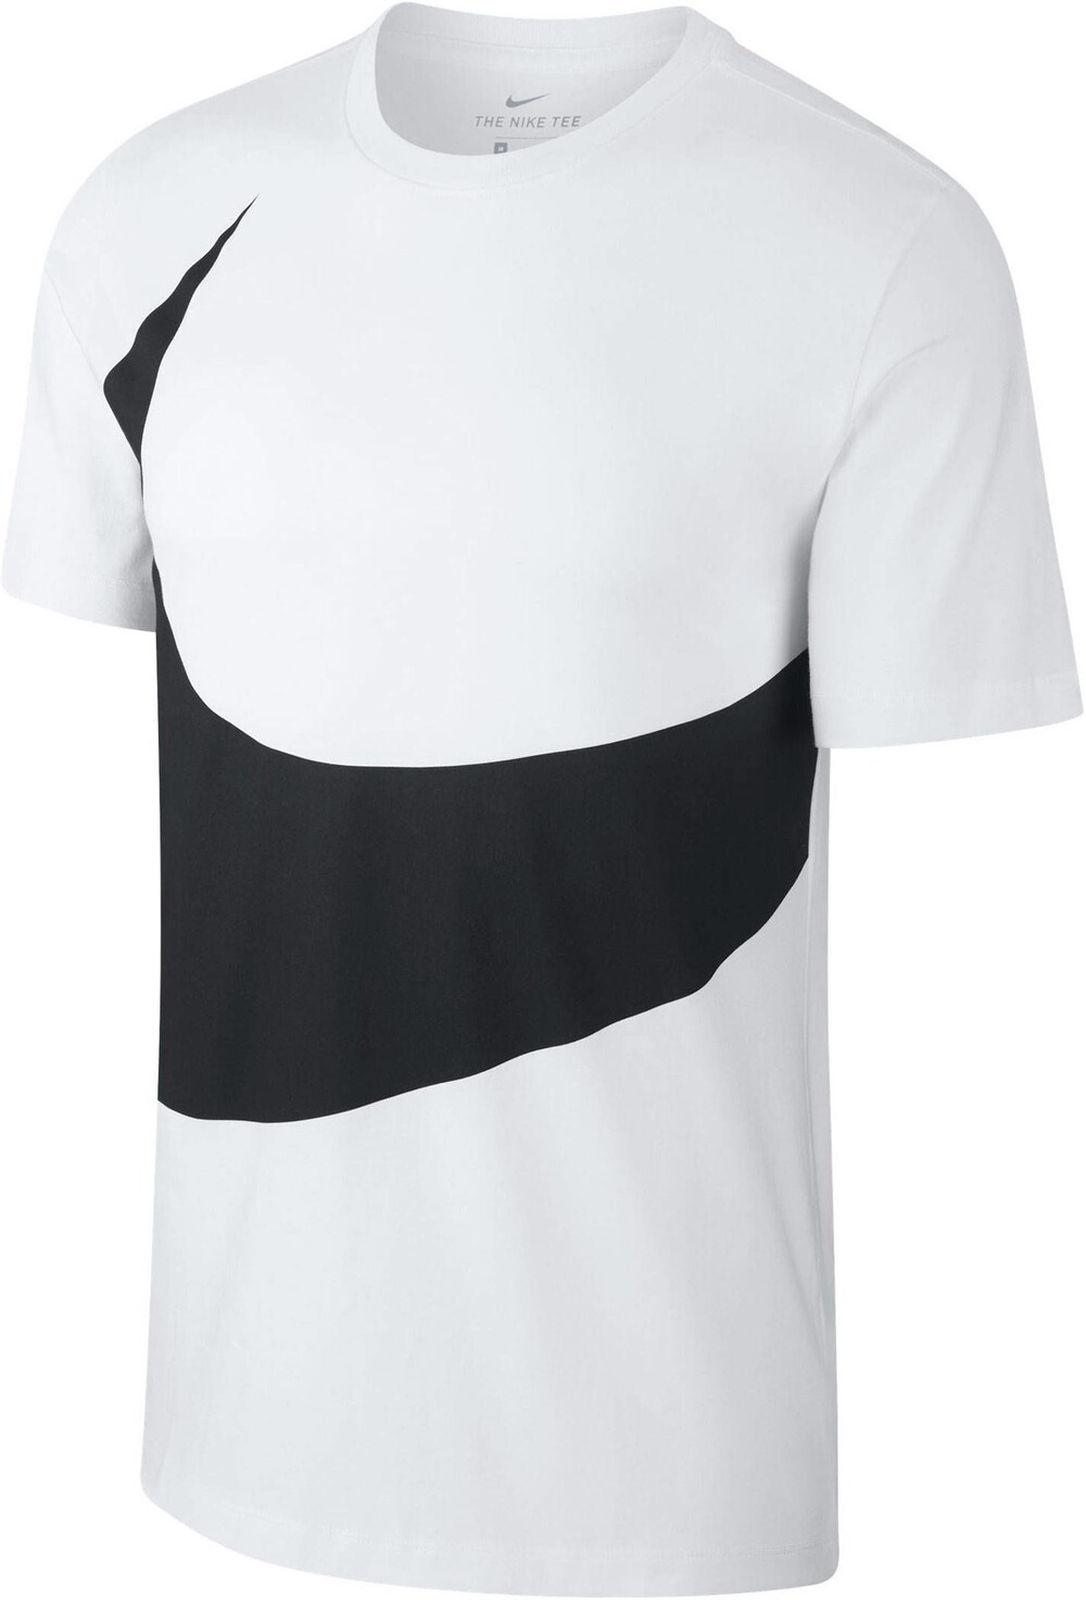 Nike señores Sport-Fitness-t-shirt nike Nsw té HBr negro blanco ar5191 010